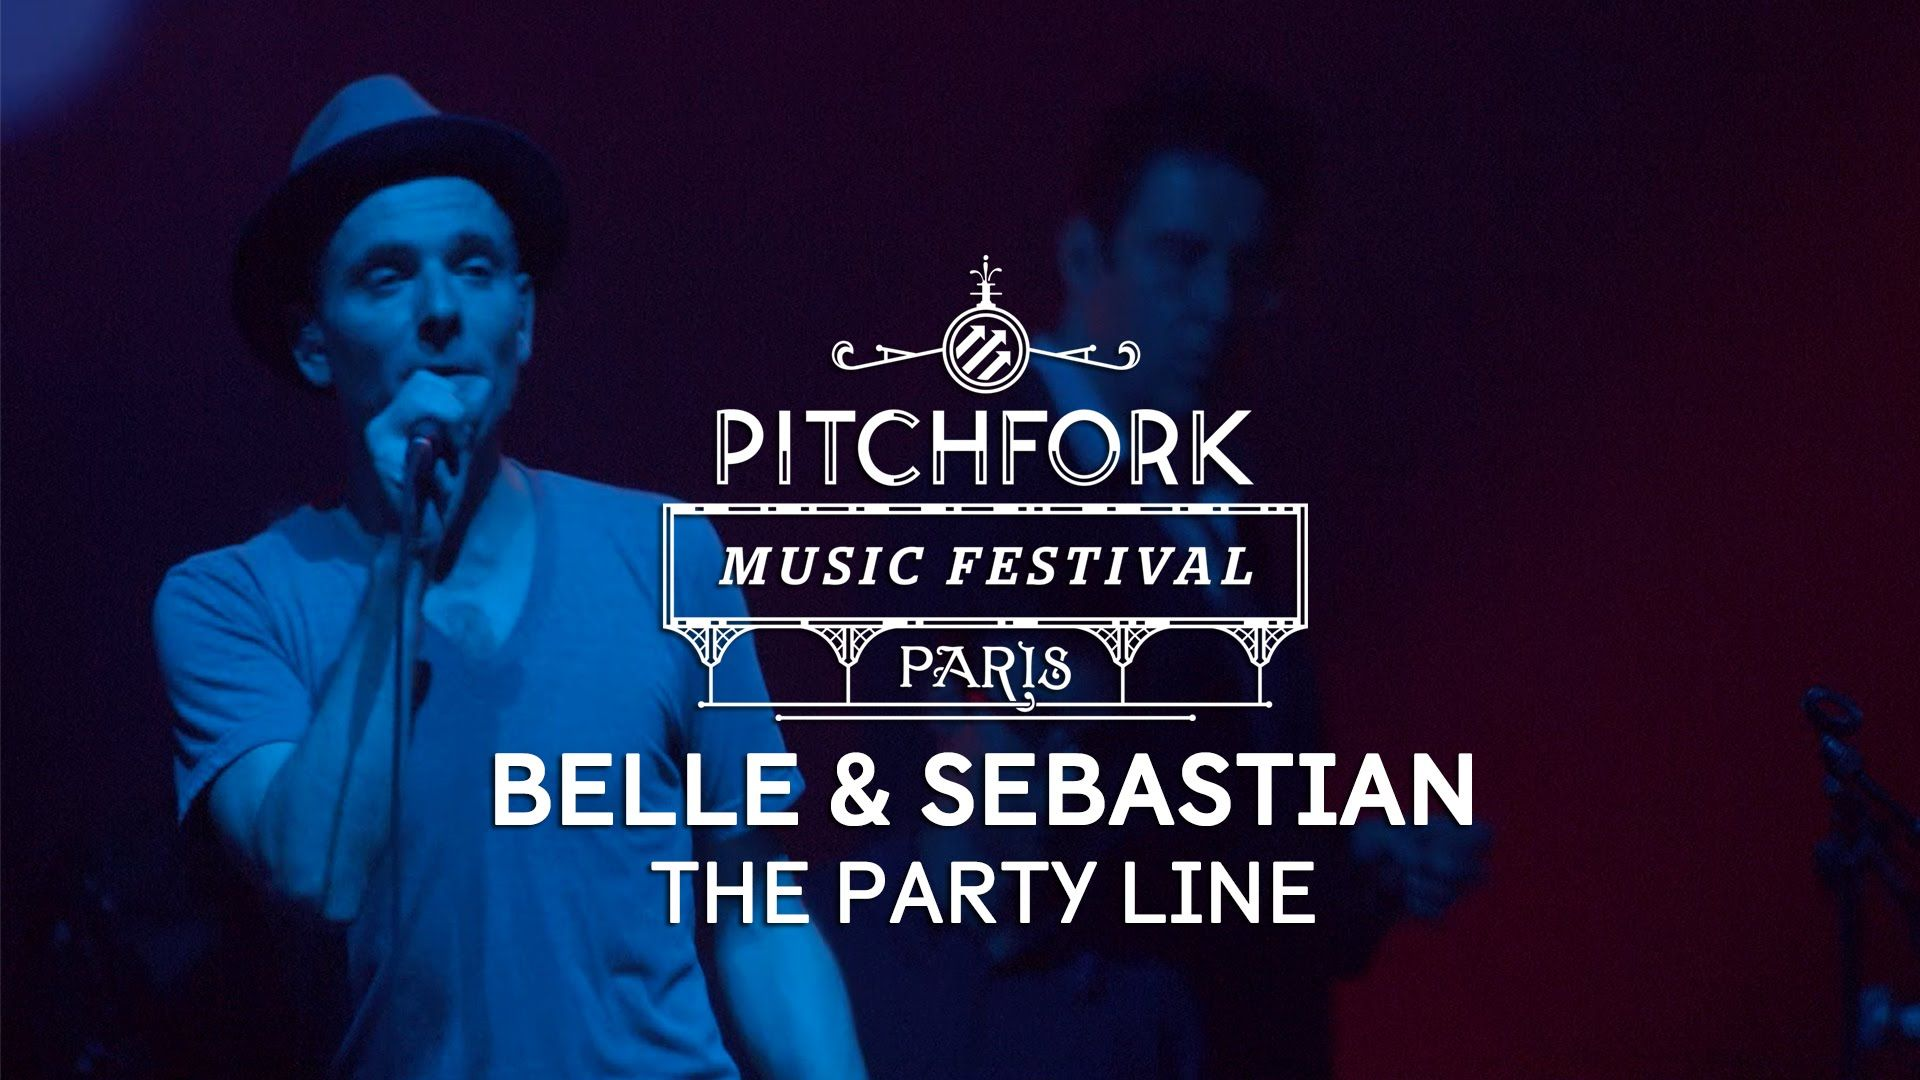 Belle Sebastian The Party Line Live At Gabemax Pitchfork Music Festival Belle And Sebastian Indie Music